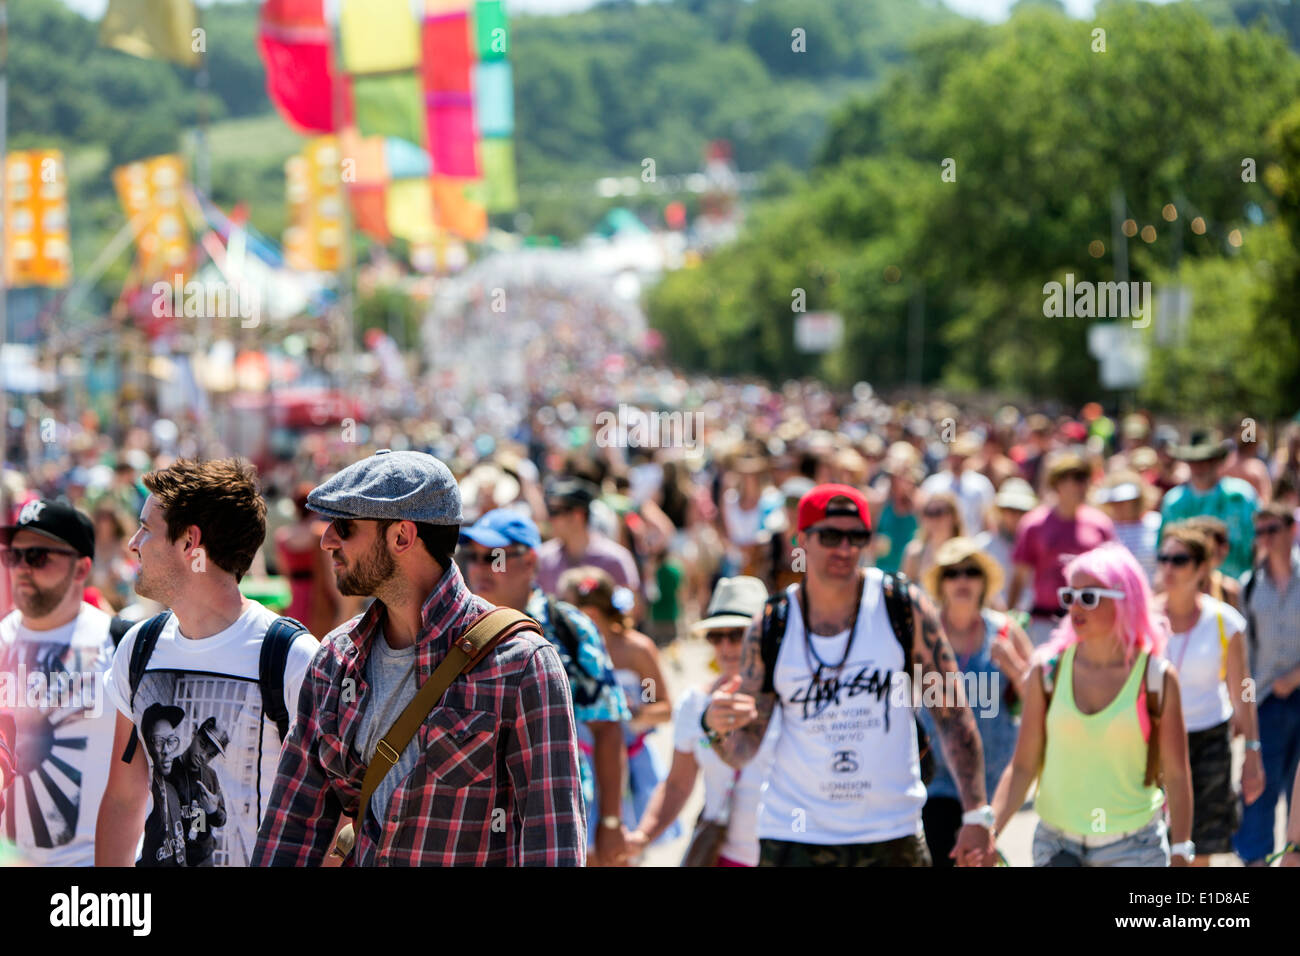 crowded-people-in-glastonbury-festival-2